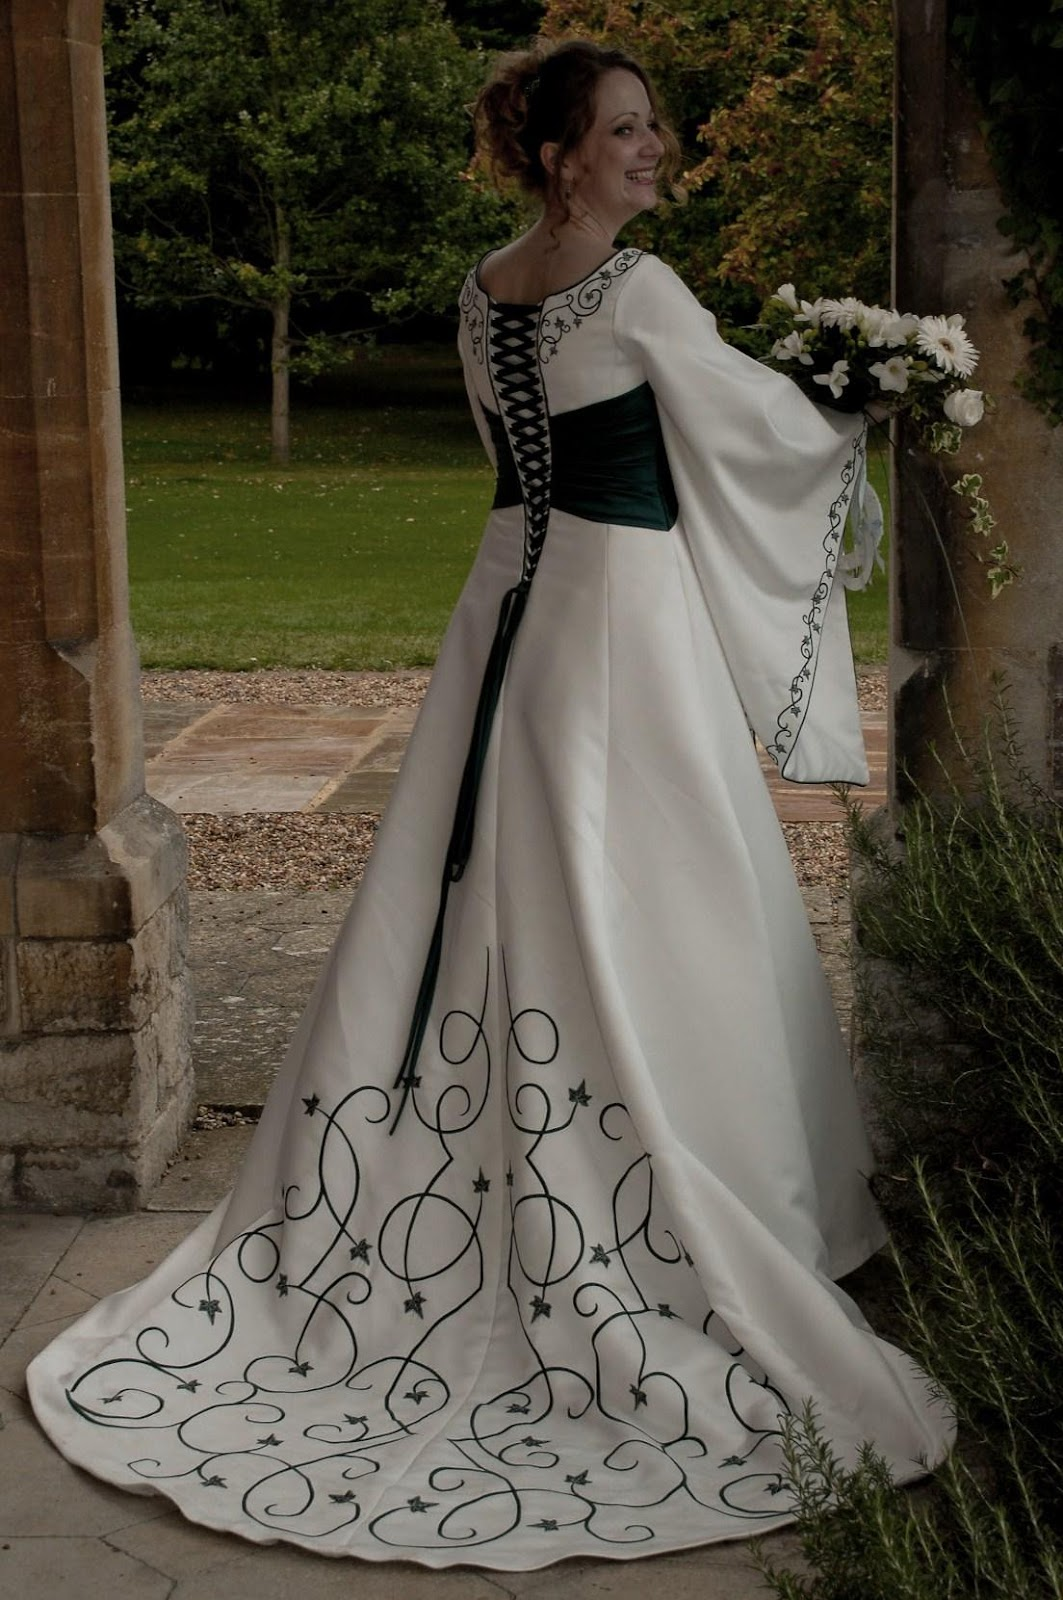 Tabytha's blog: teal flourish wedding